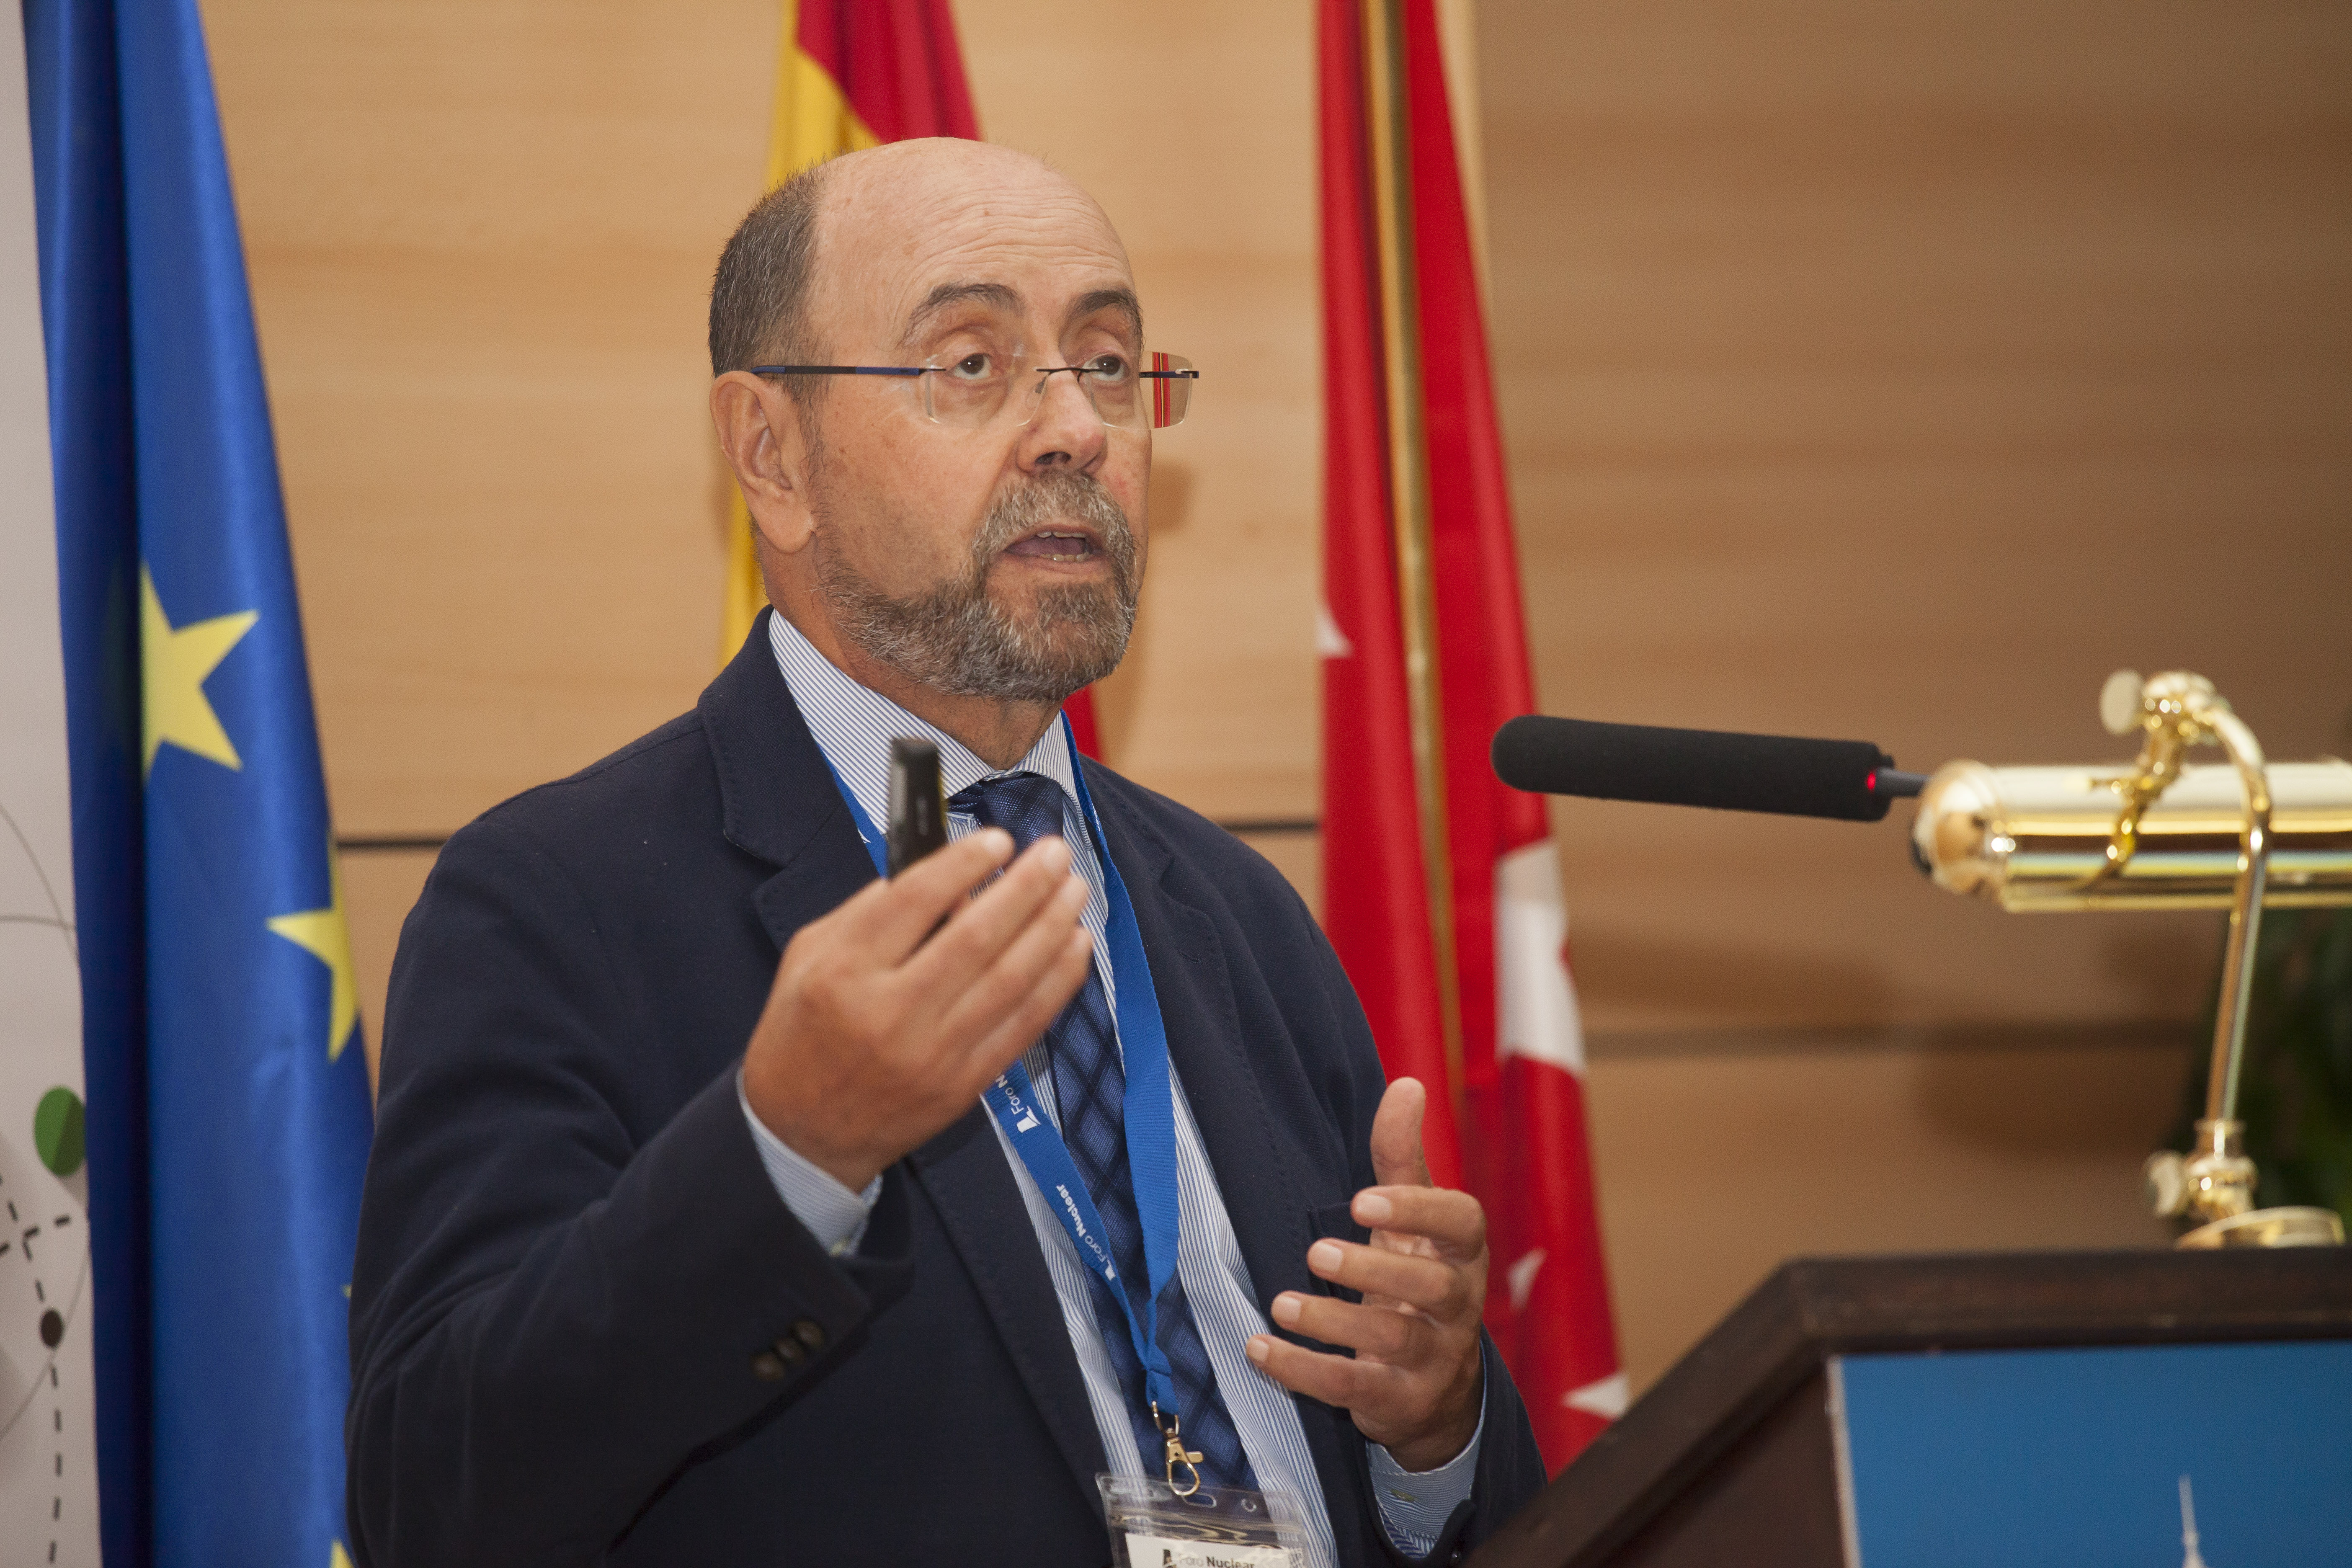 Emilio Mínguez, Catedrático de Tecnología Nuclear de la ETSII de la UPM